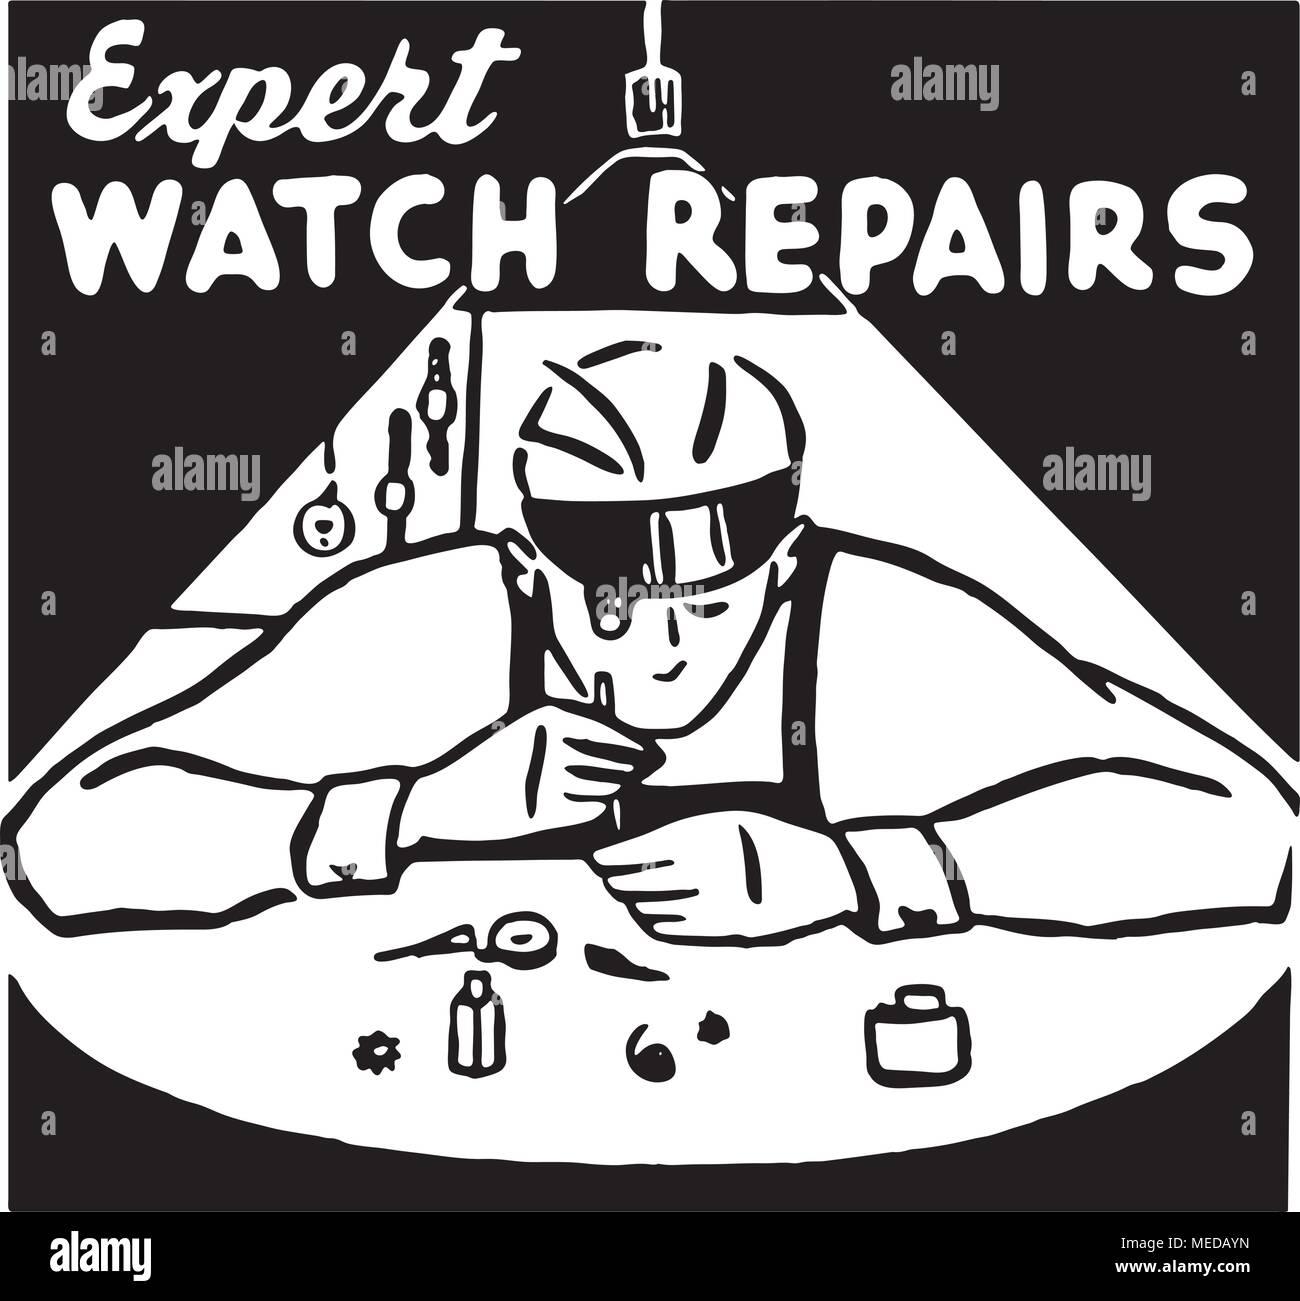 Expert Watch Repairs - Retro Ad Art Banner - Stock Vector